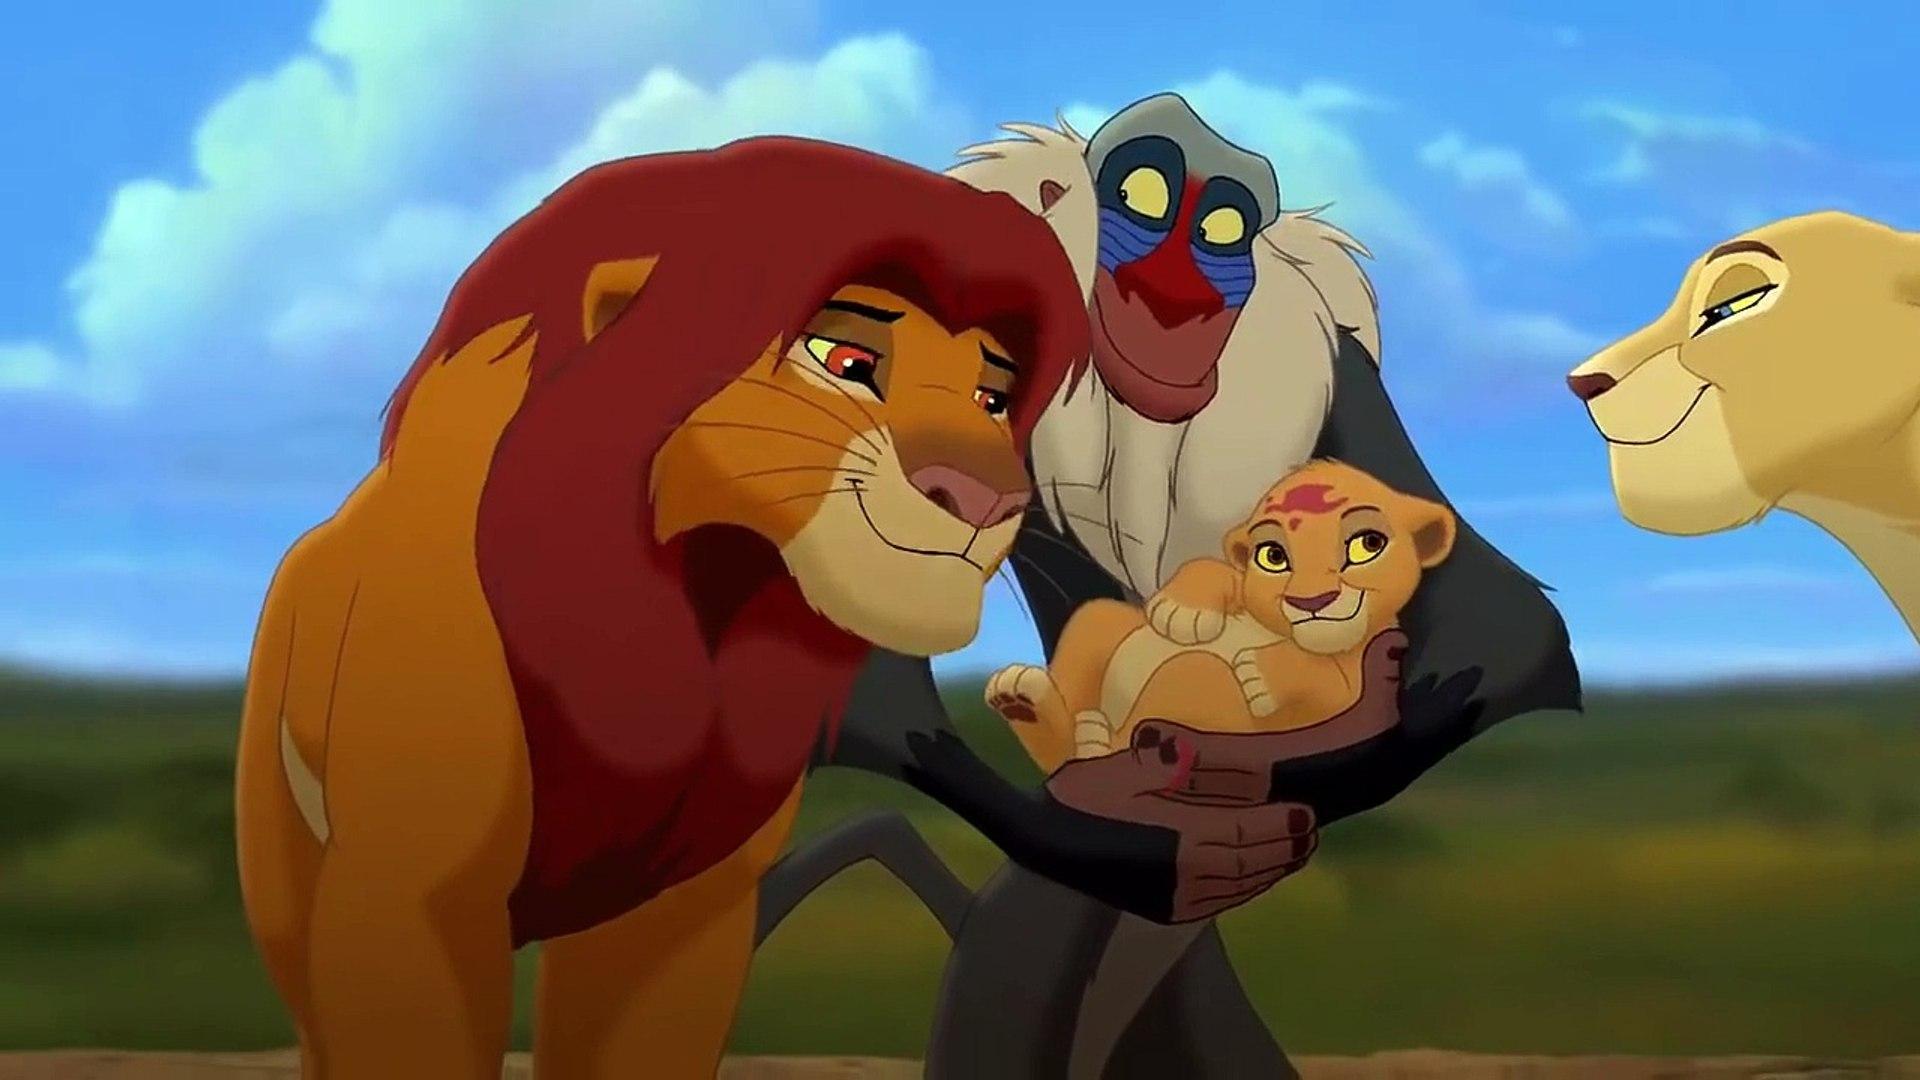 The Lion King 2 Simba S Pride Simba Assigns Timon And Pumbaa To Watch Kiara Hd Video Dailymotion